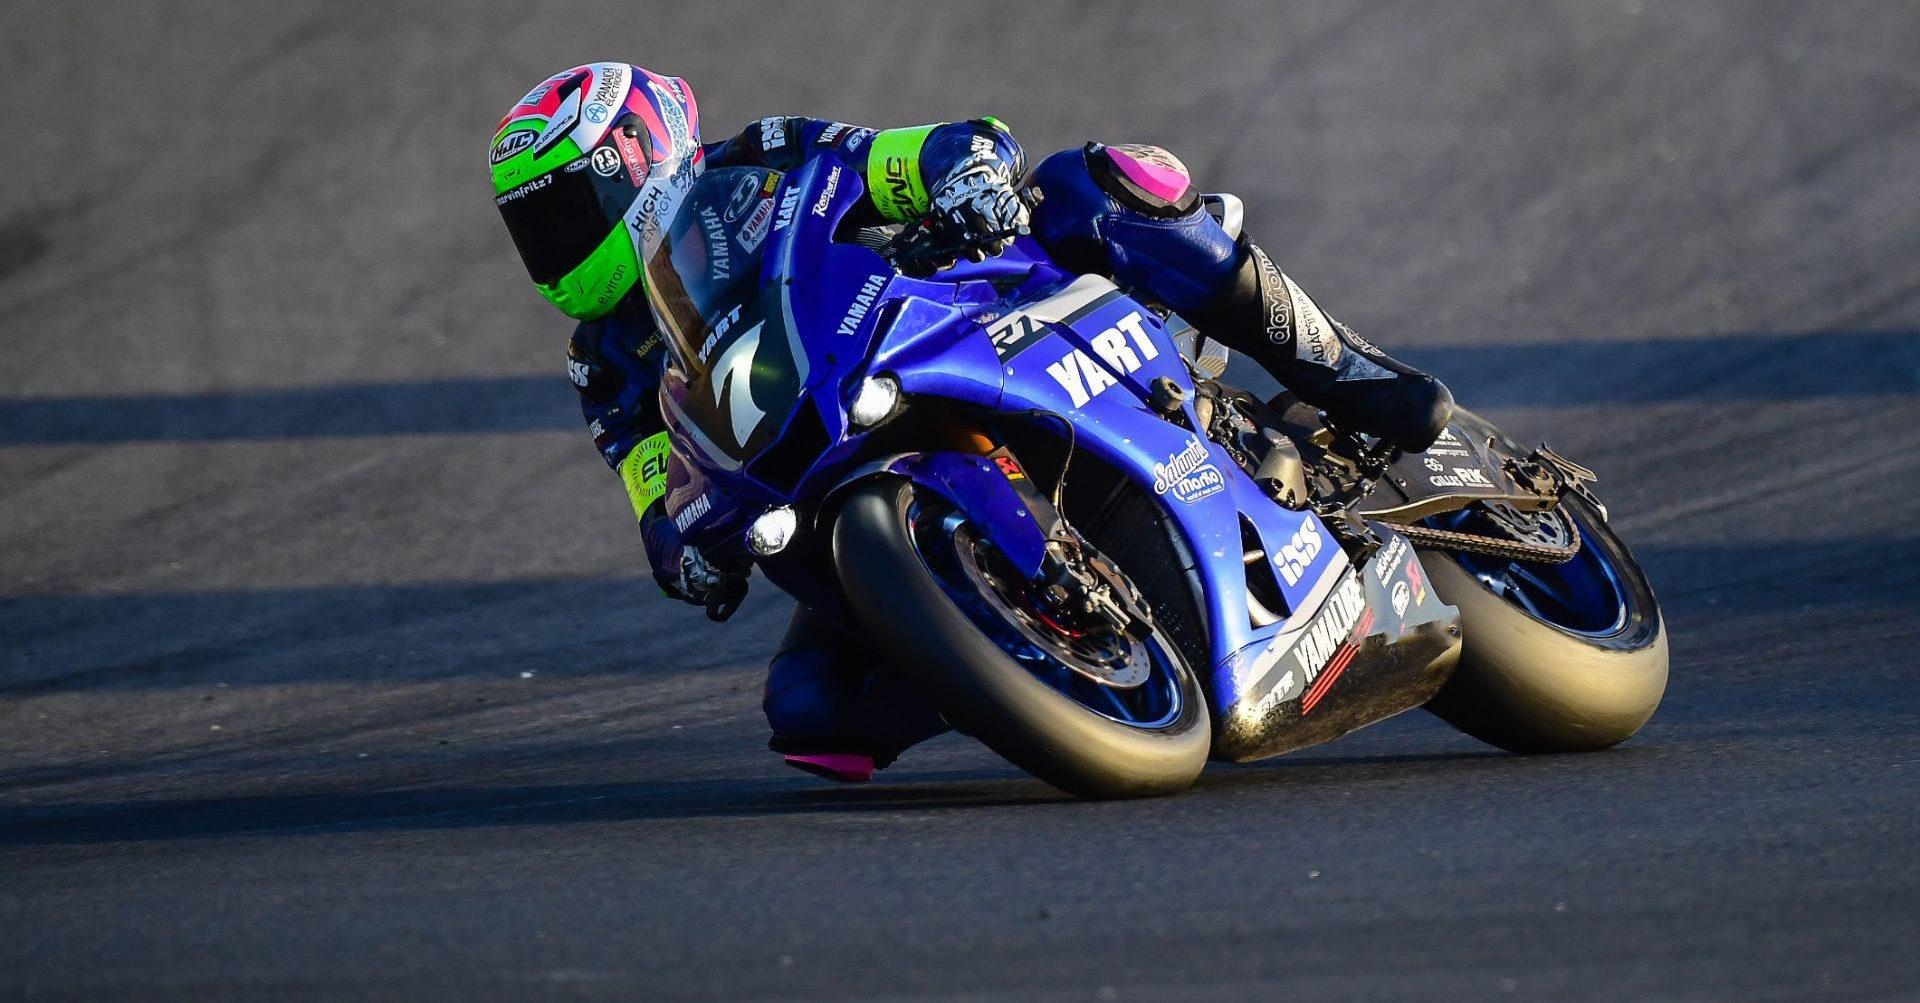 Marvin Fritz (7) in action on the YART Yamaha YZF-R1 Endurance World Championship racebike. Photo courtesy Yamaha Racing.